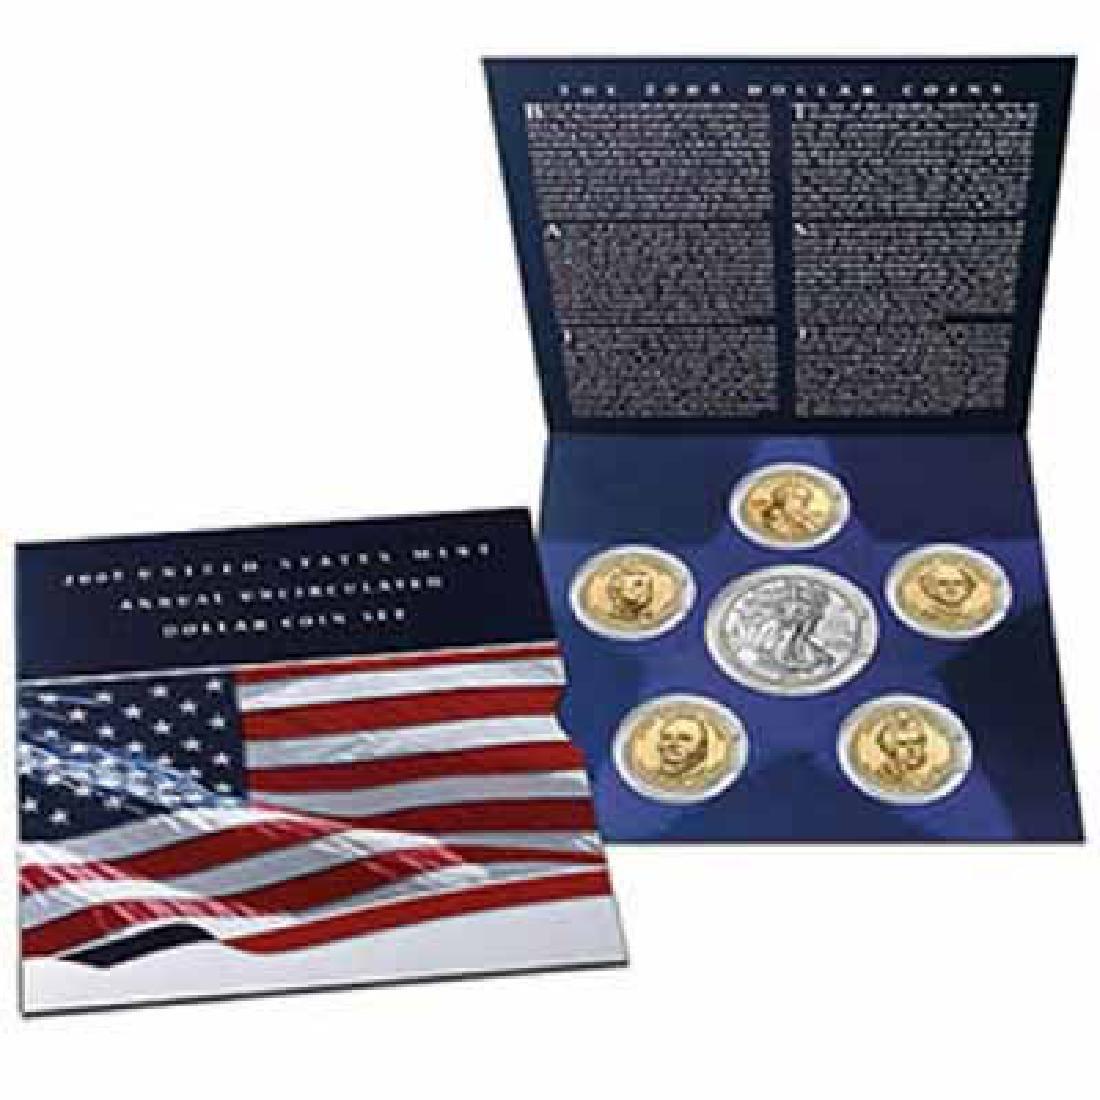 2008 U.S. Mint Annual Uncirculated Dollar Coin Set